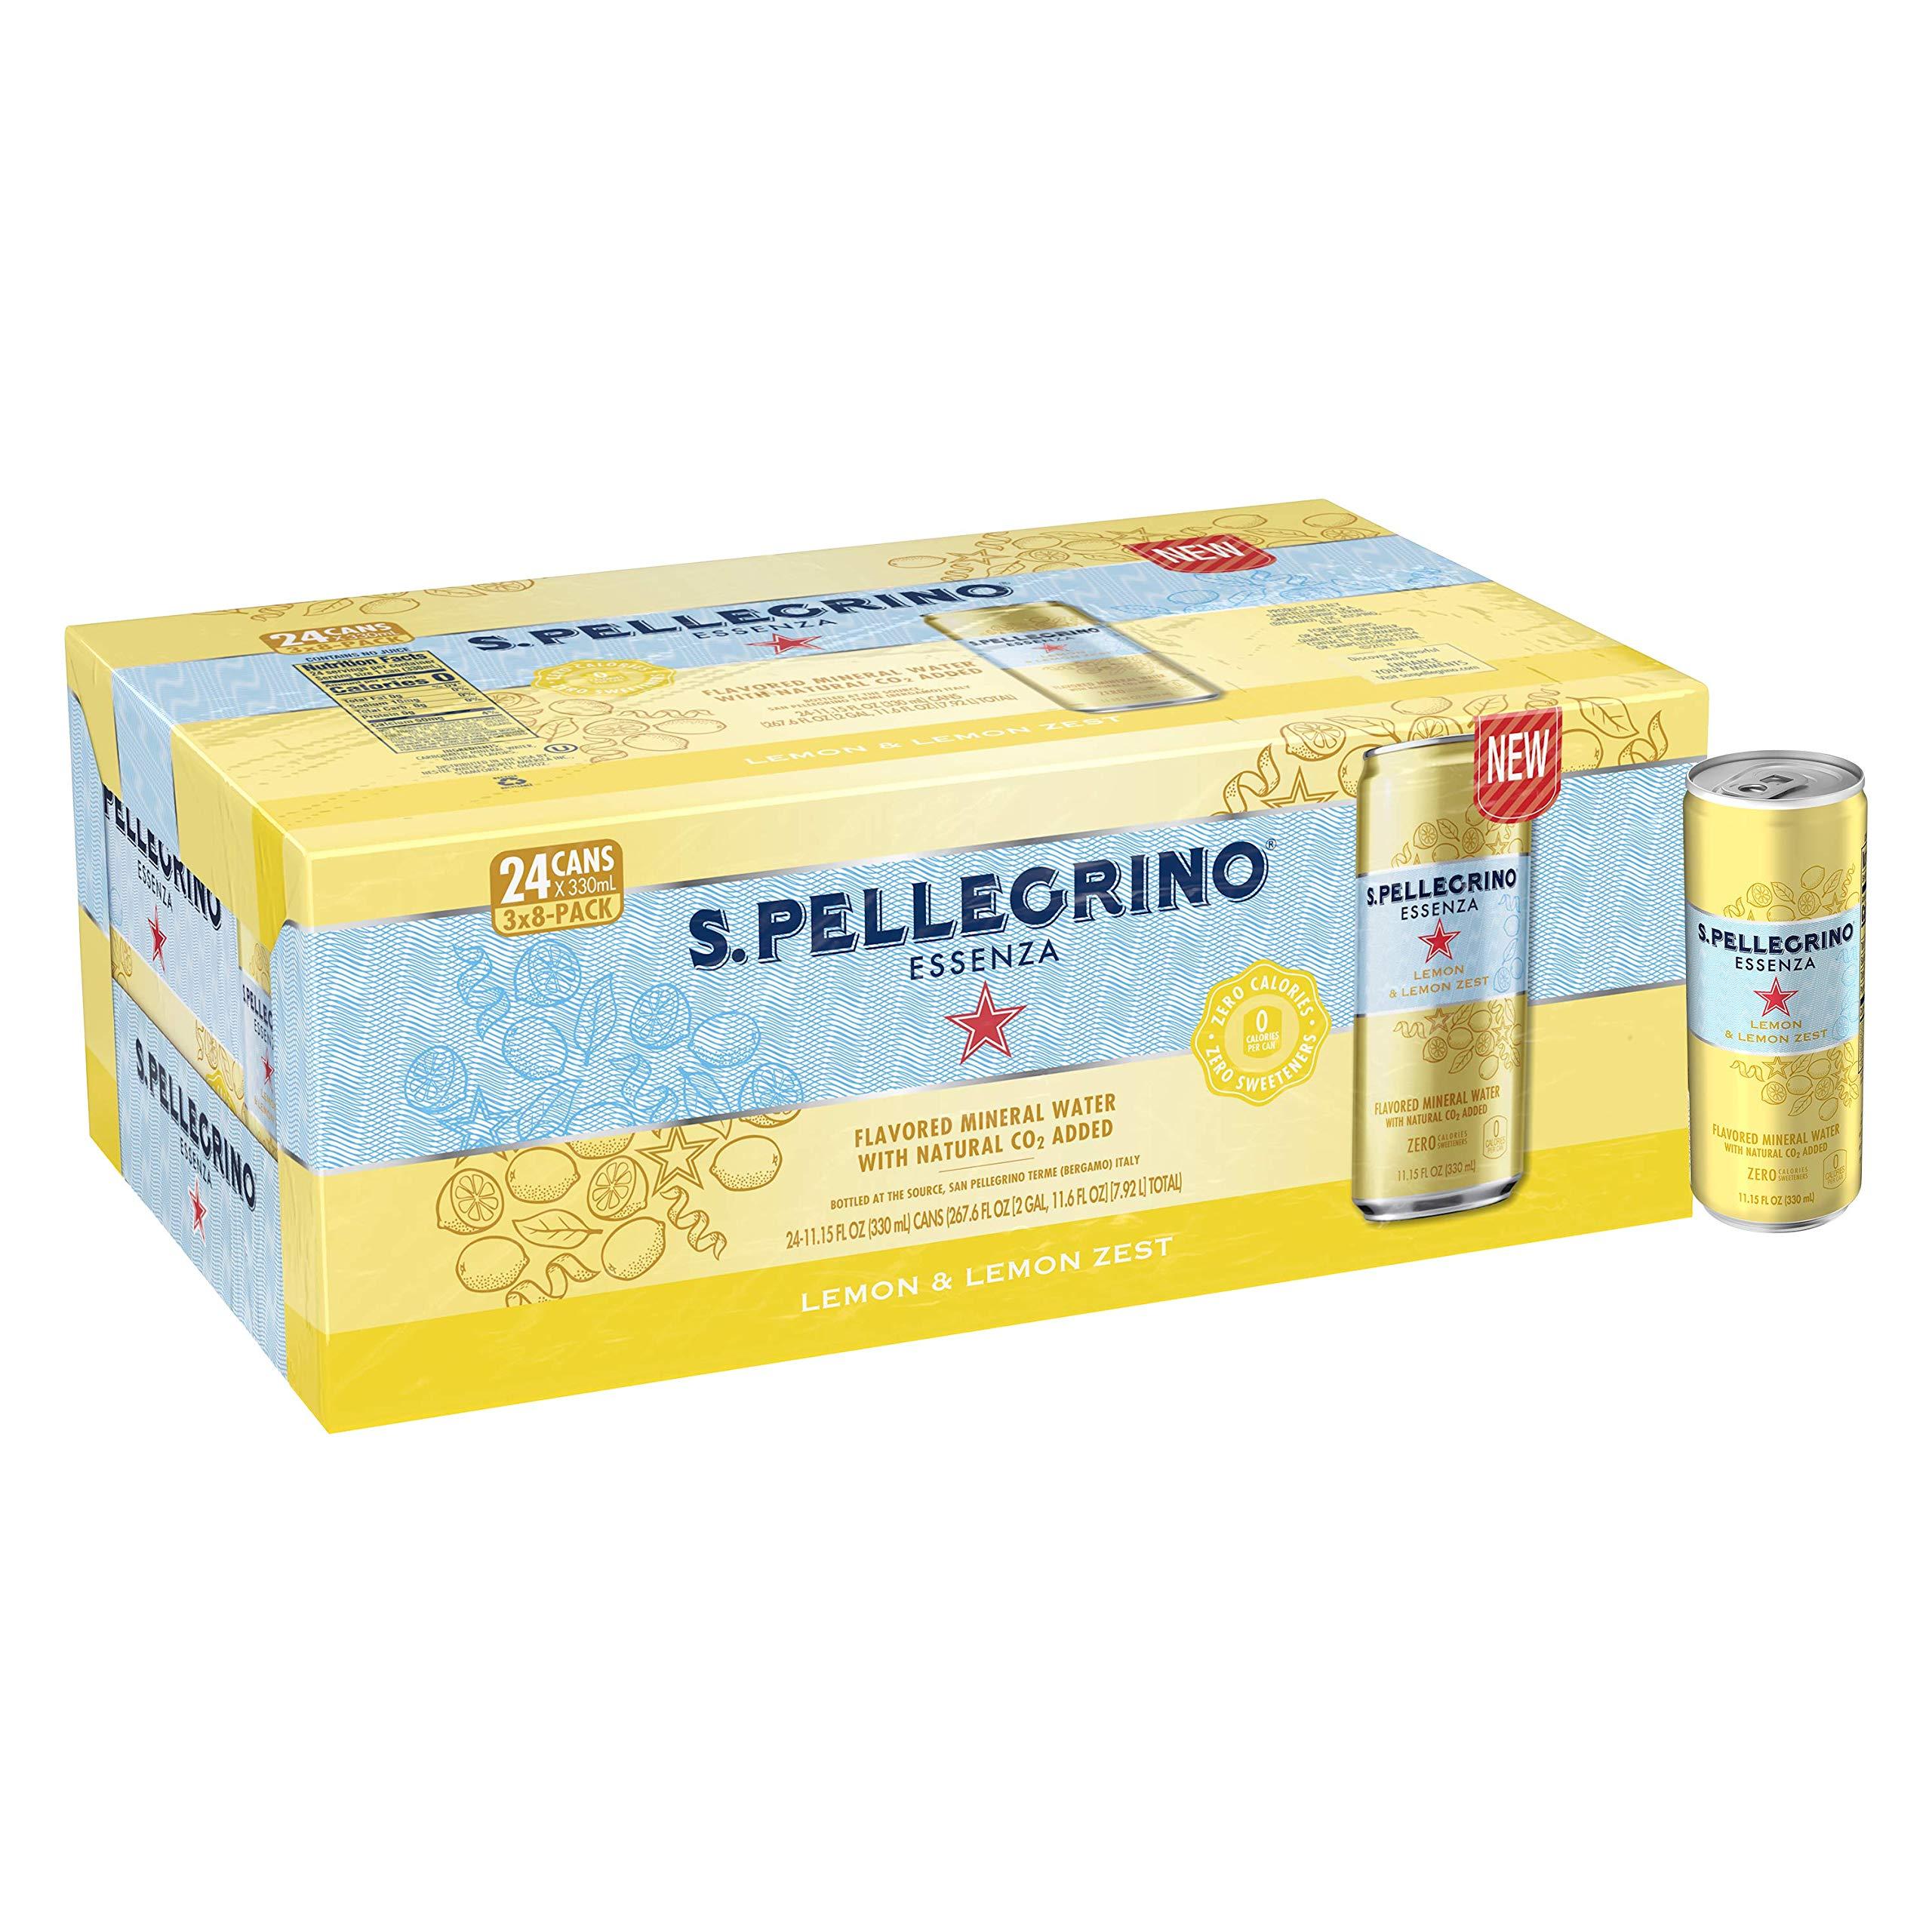 S.Pellegrino Essenza Lemon & Lemon Zest Flavored Mineral Water Cans, 11.15 Fl Oz (24 Pack)